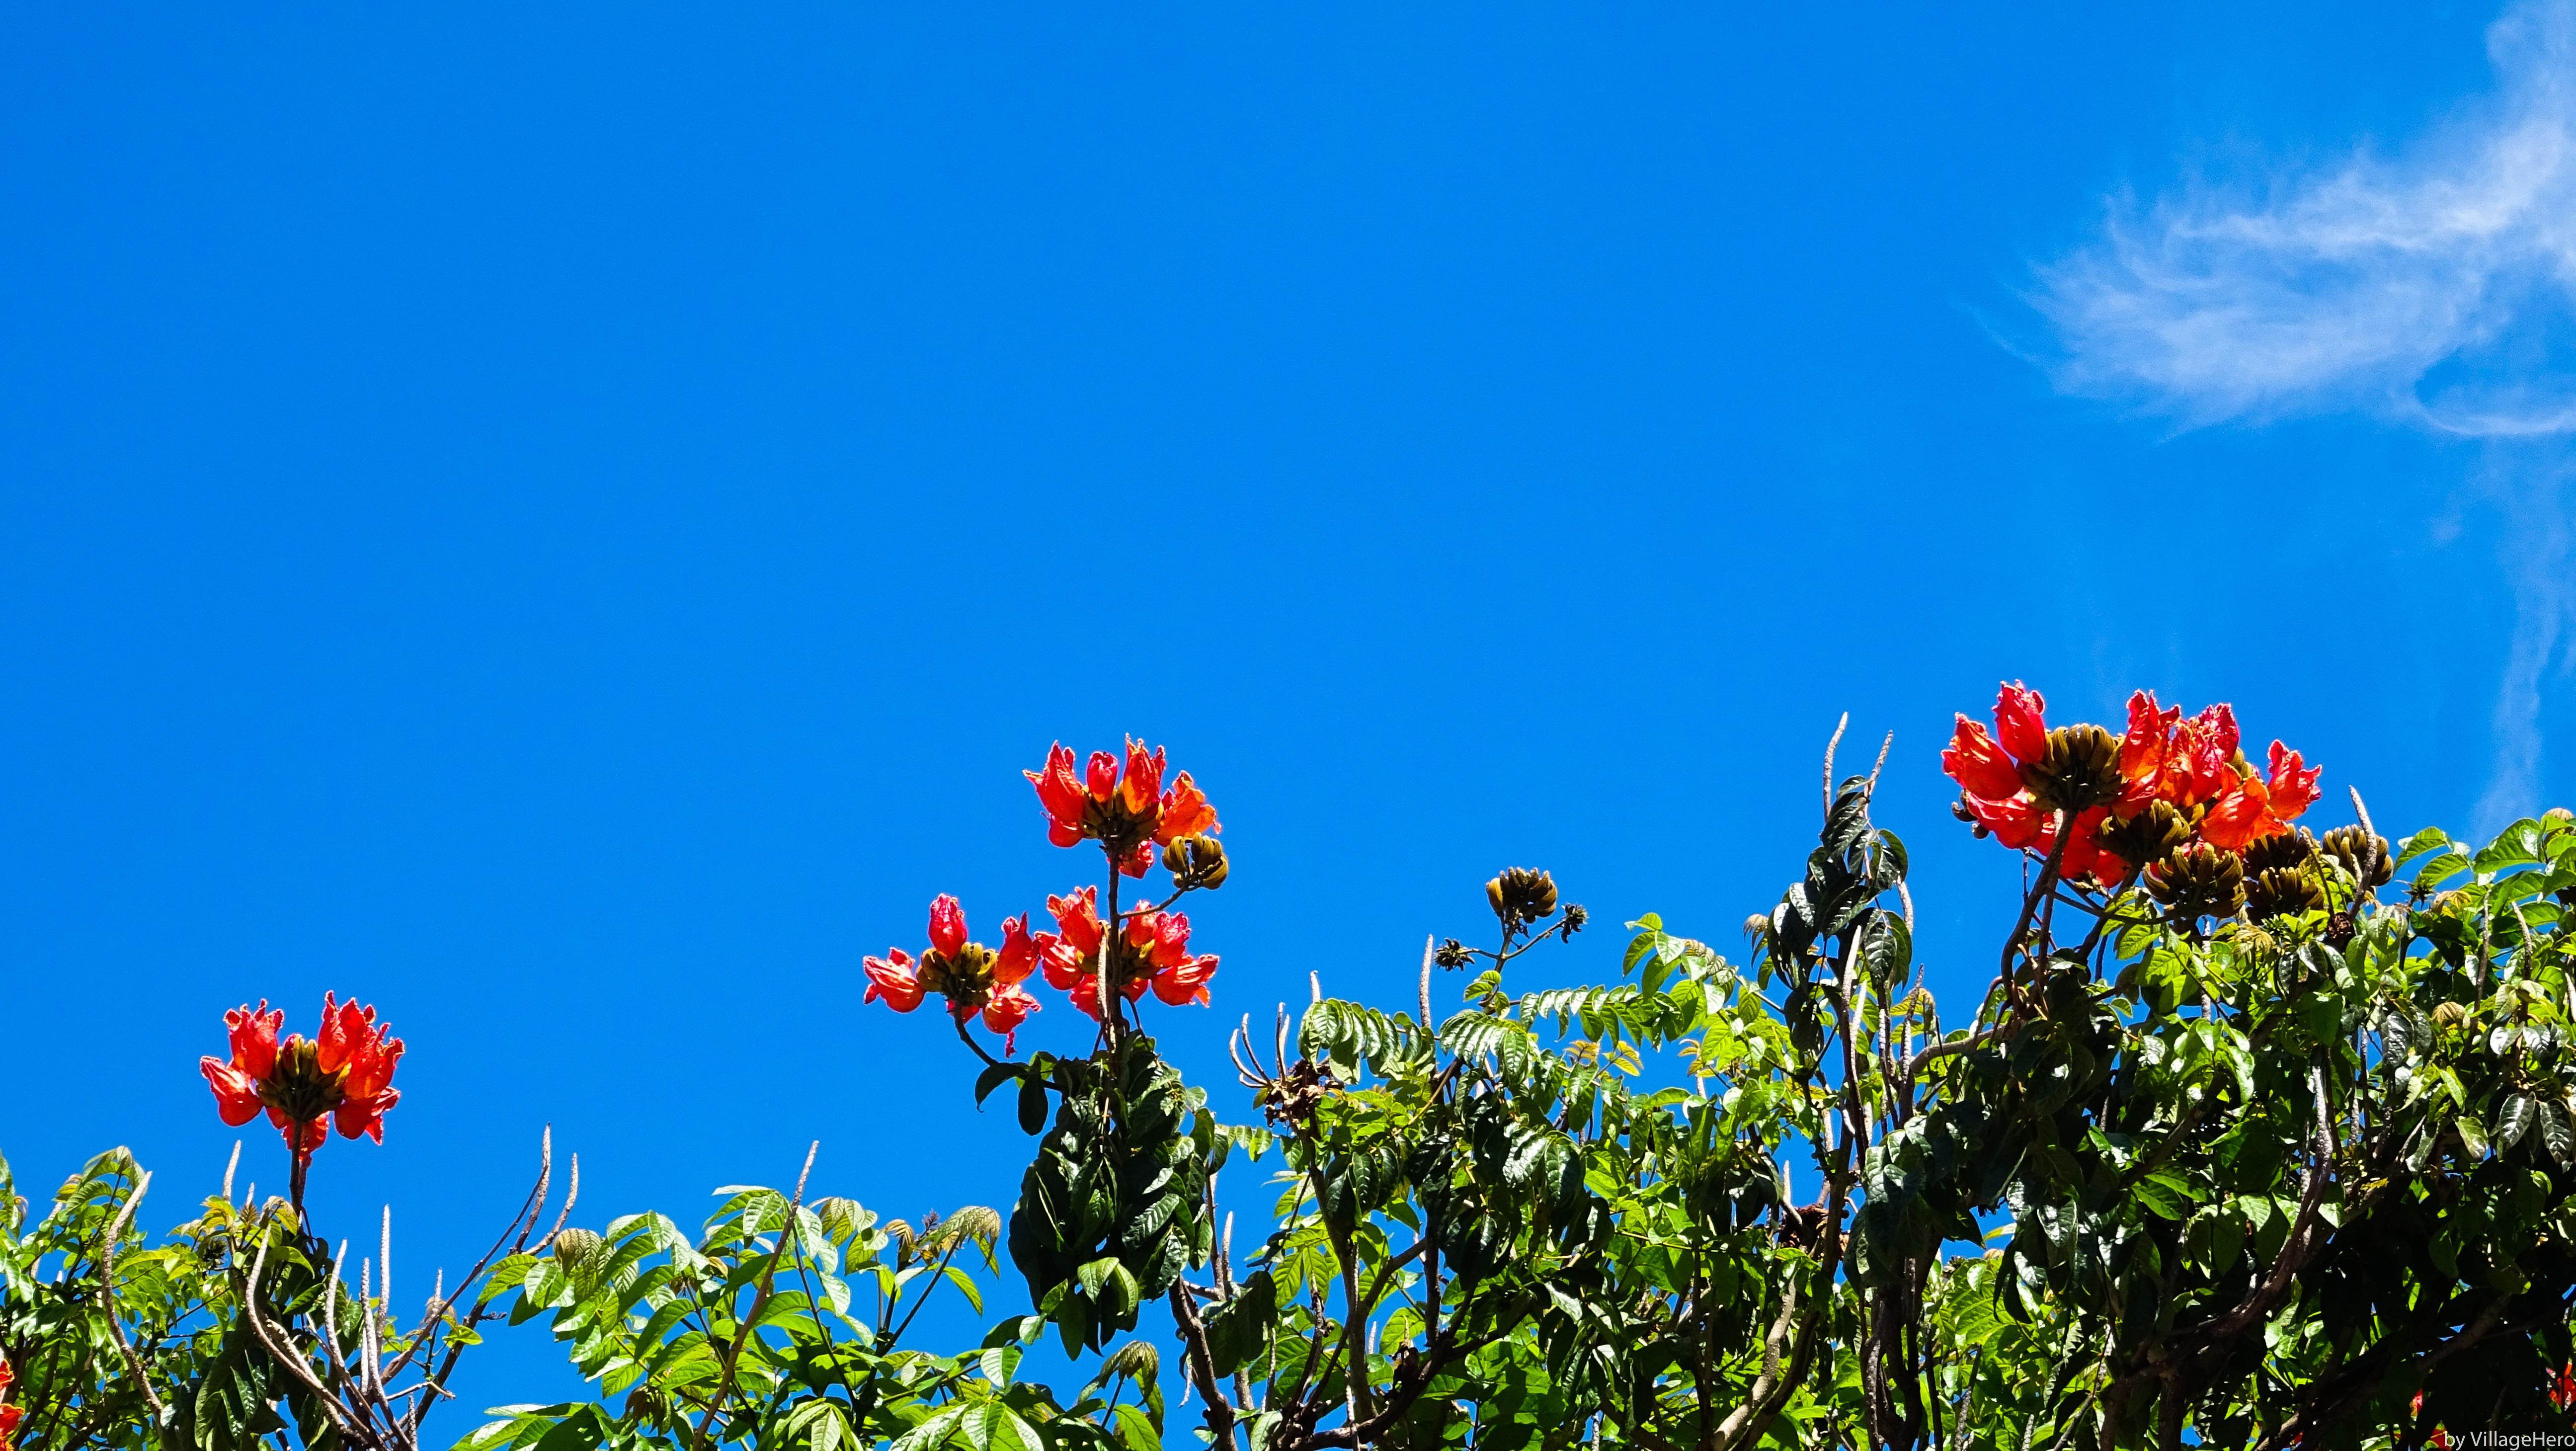 File:Blooming tree sky cloud (38044678346).jpg - Wikimedia Commons